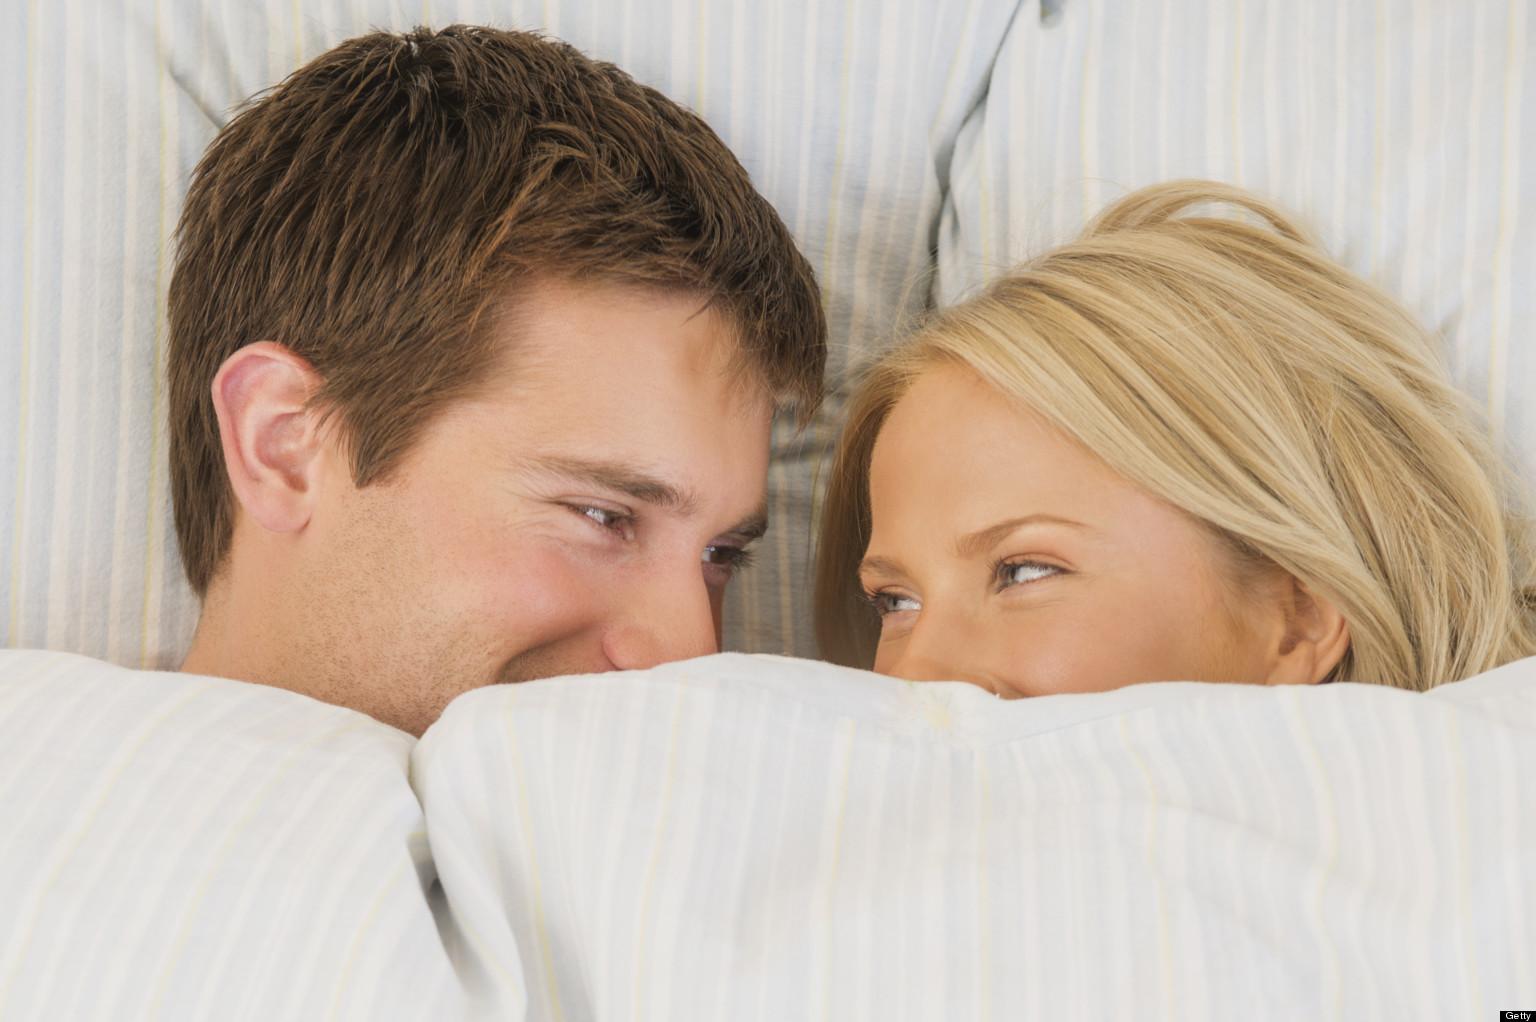 Improve Sex Life: 10 Ways Women Can De-Stress And Reboot: http://www.huffingtonpost.ca/2013/06/05/improve-sex-life_n_3390871.html